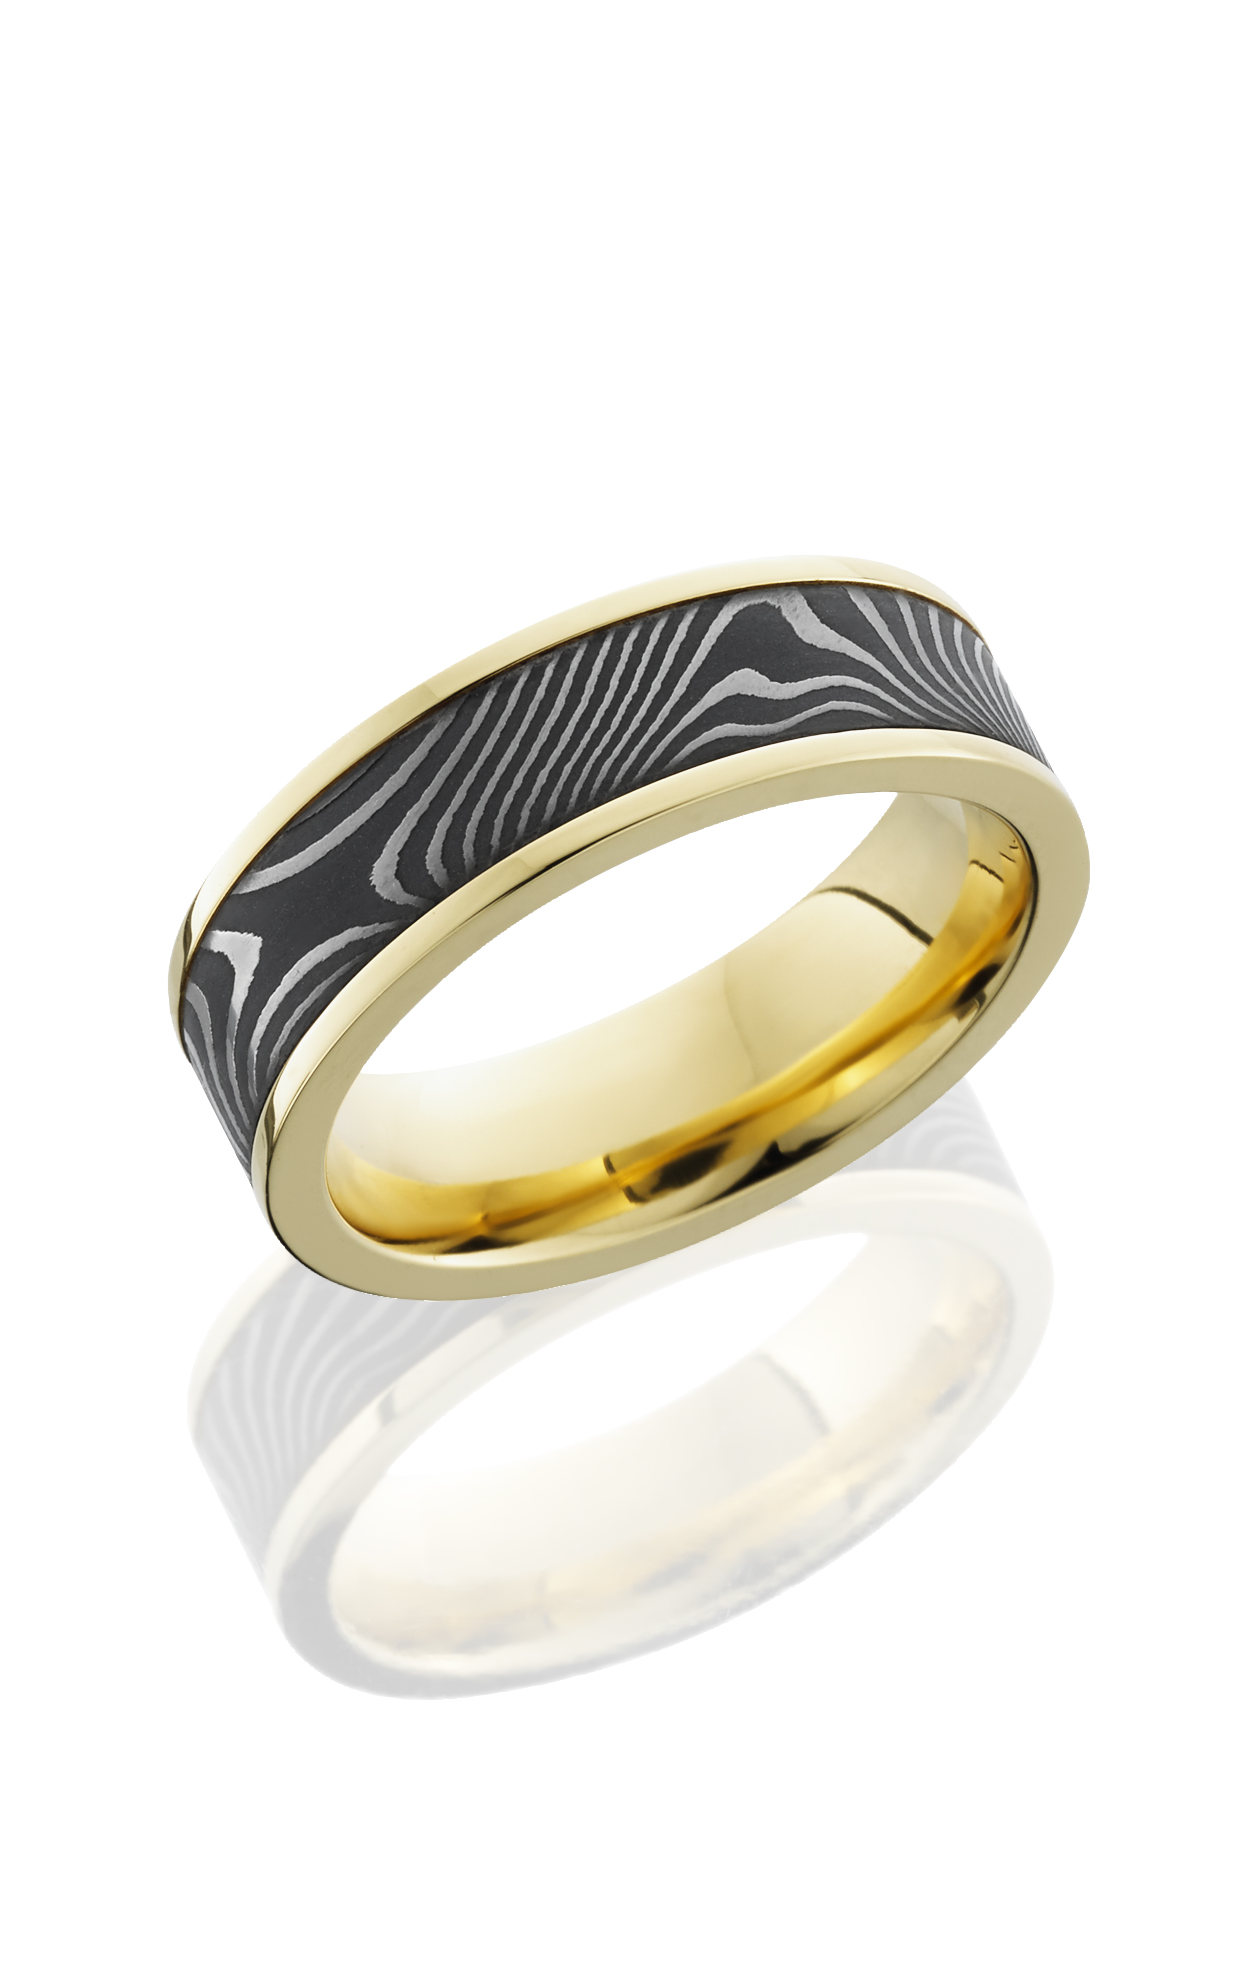 Lashbrook Precious Metals Wedding band 90055 product image